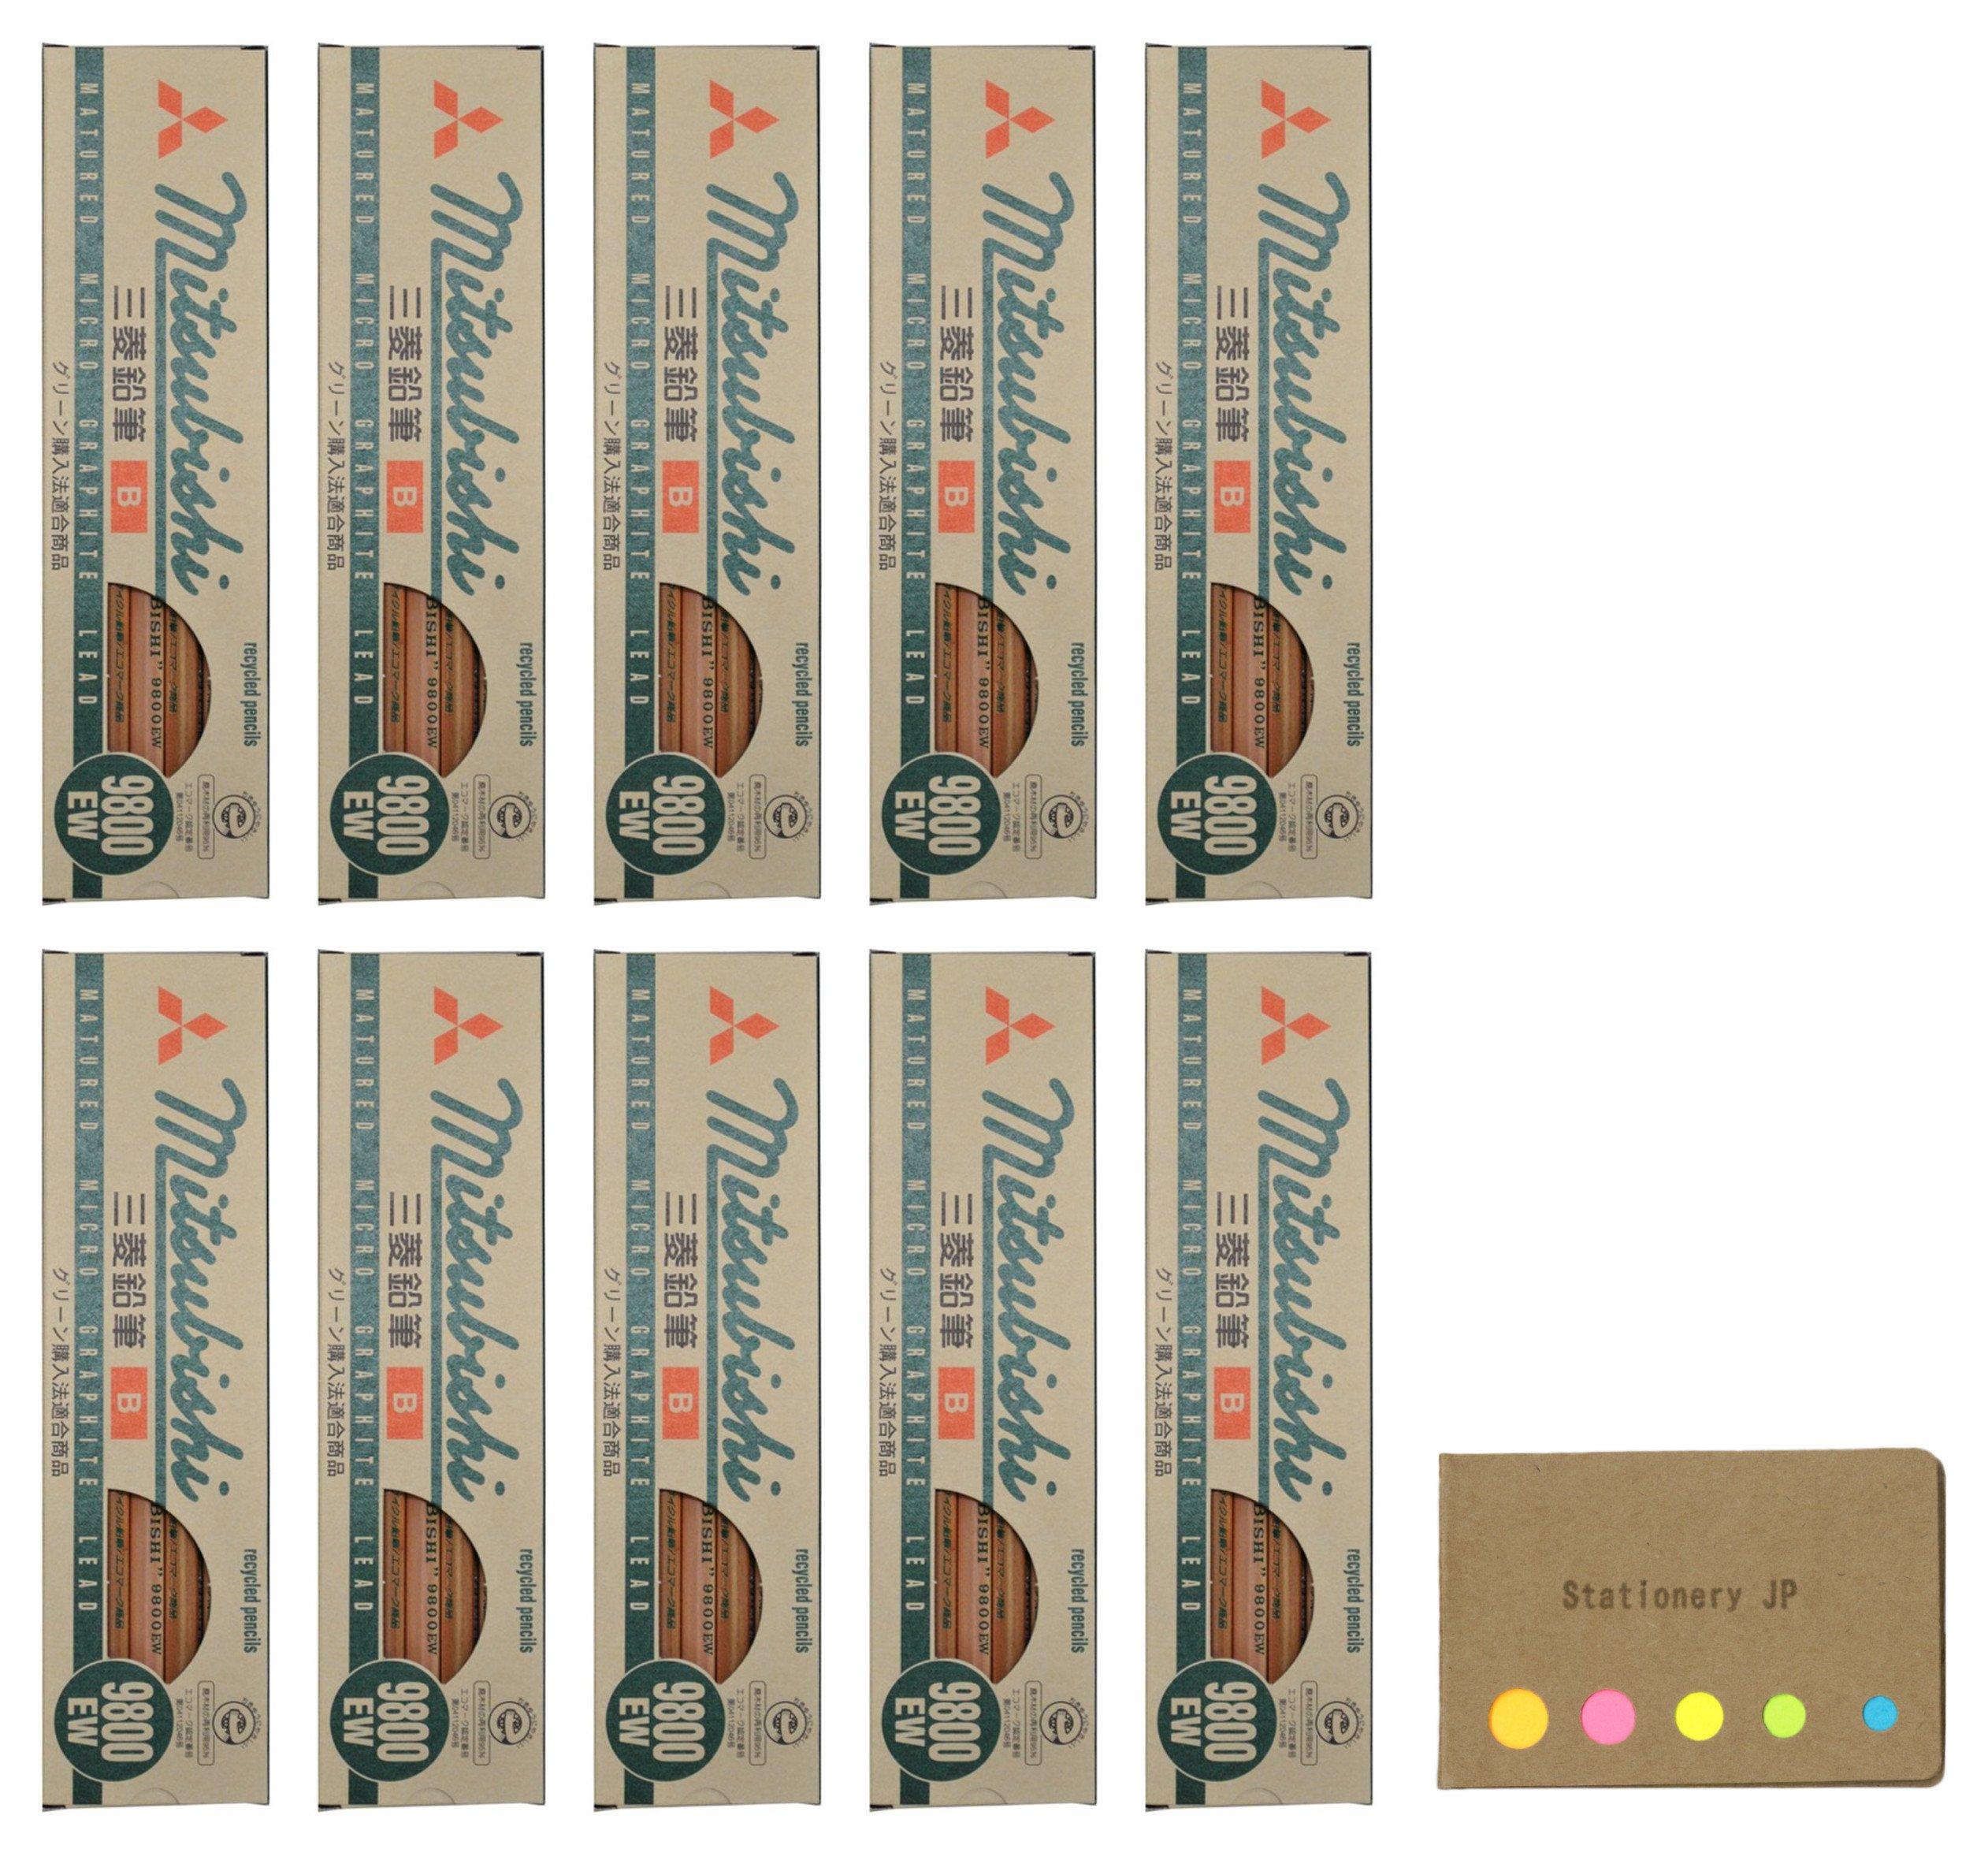 Uni Mitsubishi 9800EW Recycling Pencil, B, 10-pack/total 120 pcs, Sticky Notes Value Set